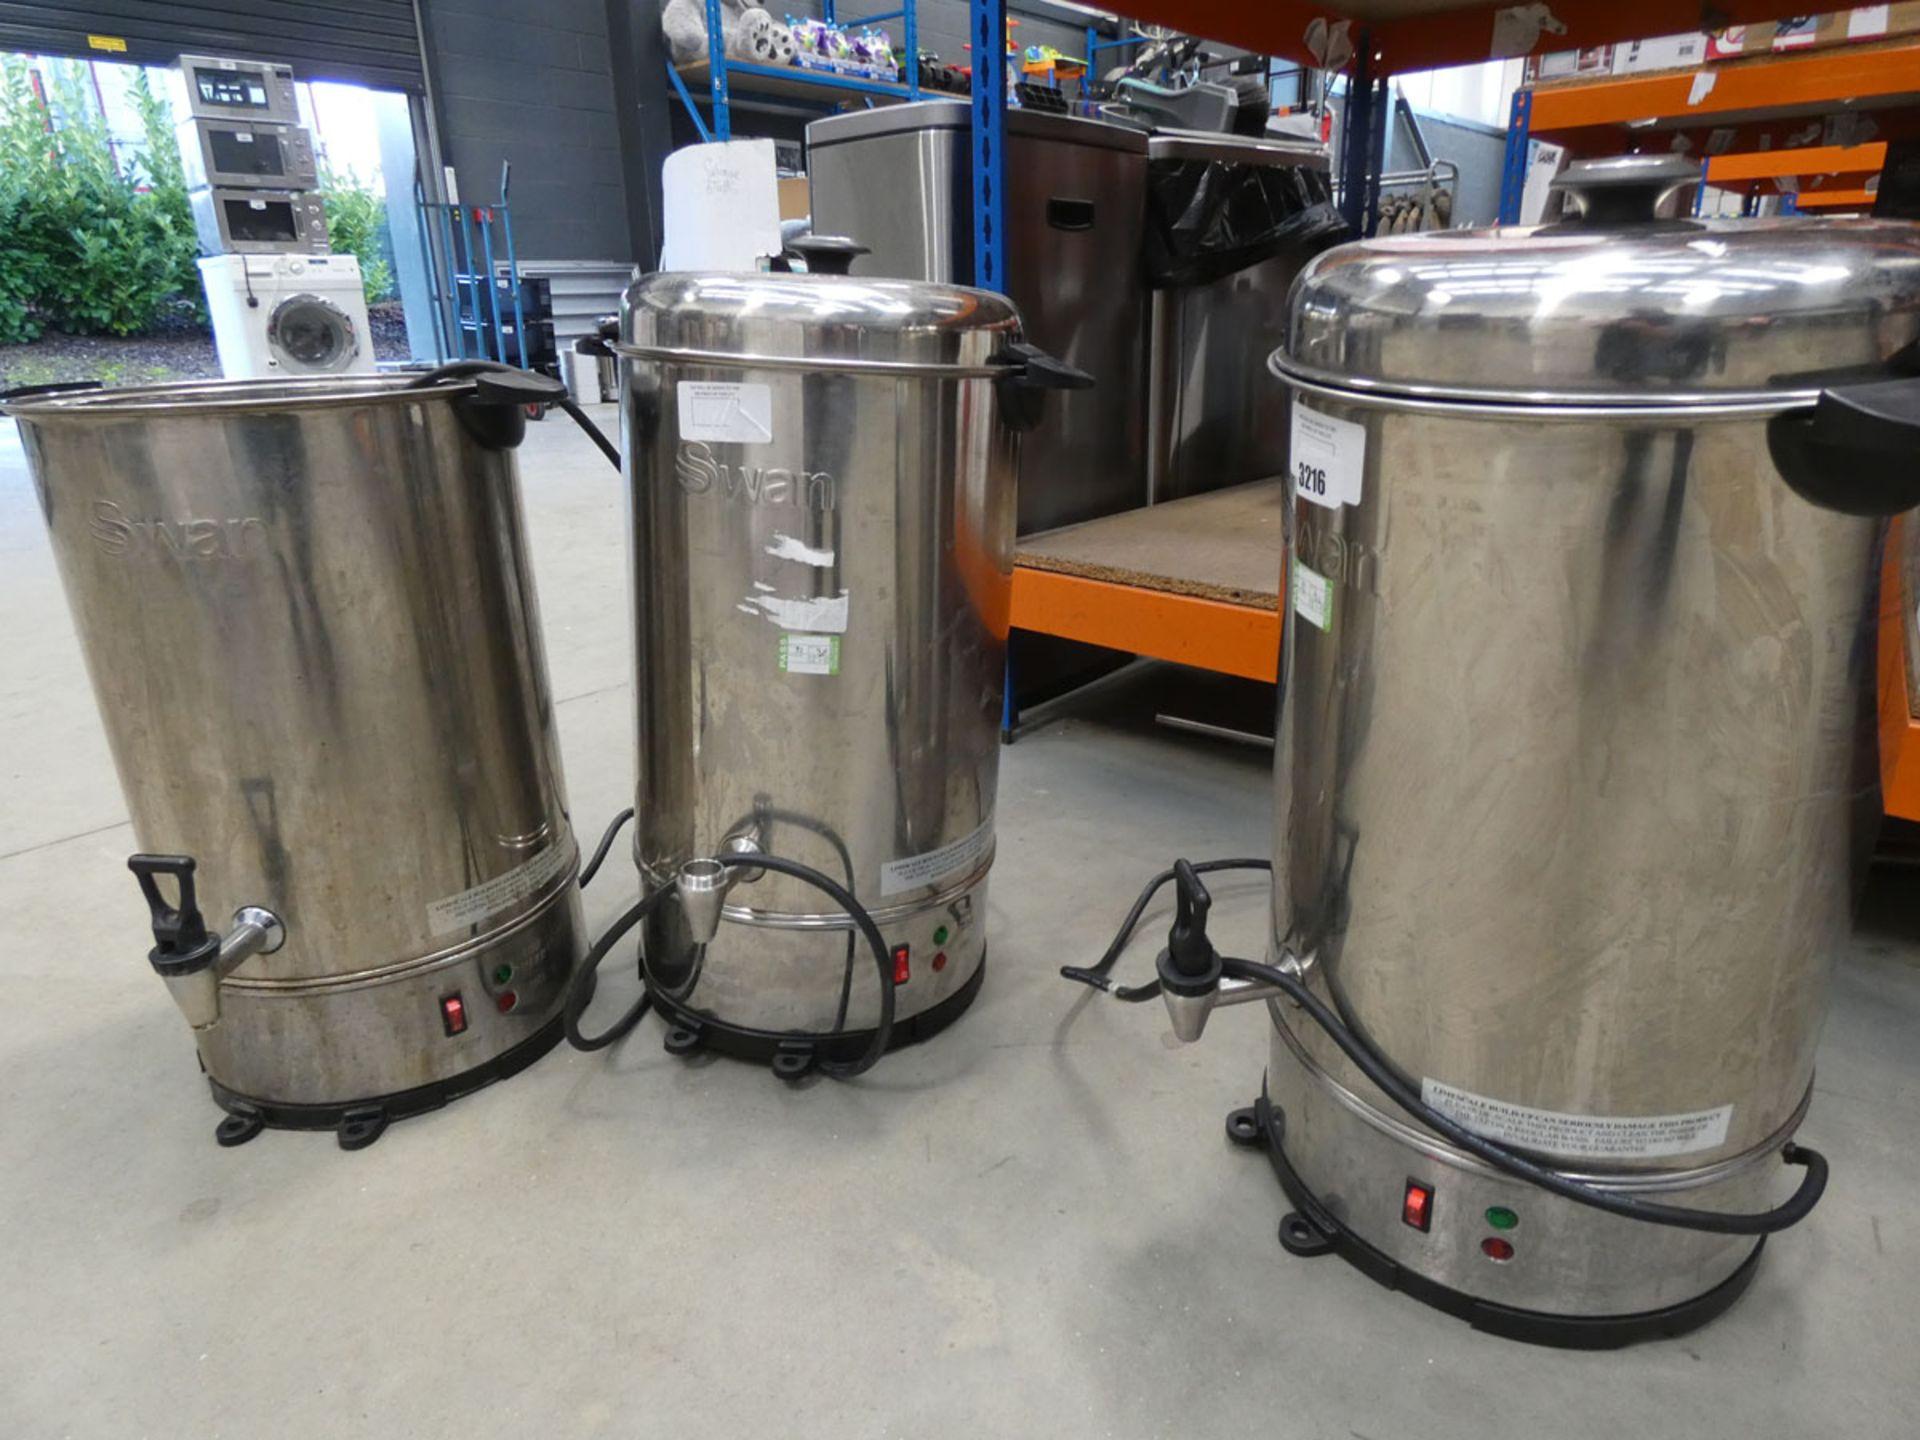 2096 - 2 unboxed Swan water filters